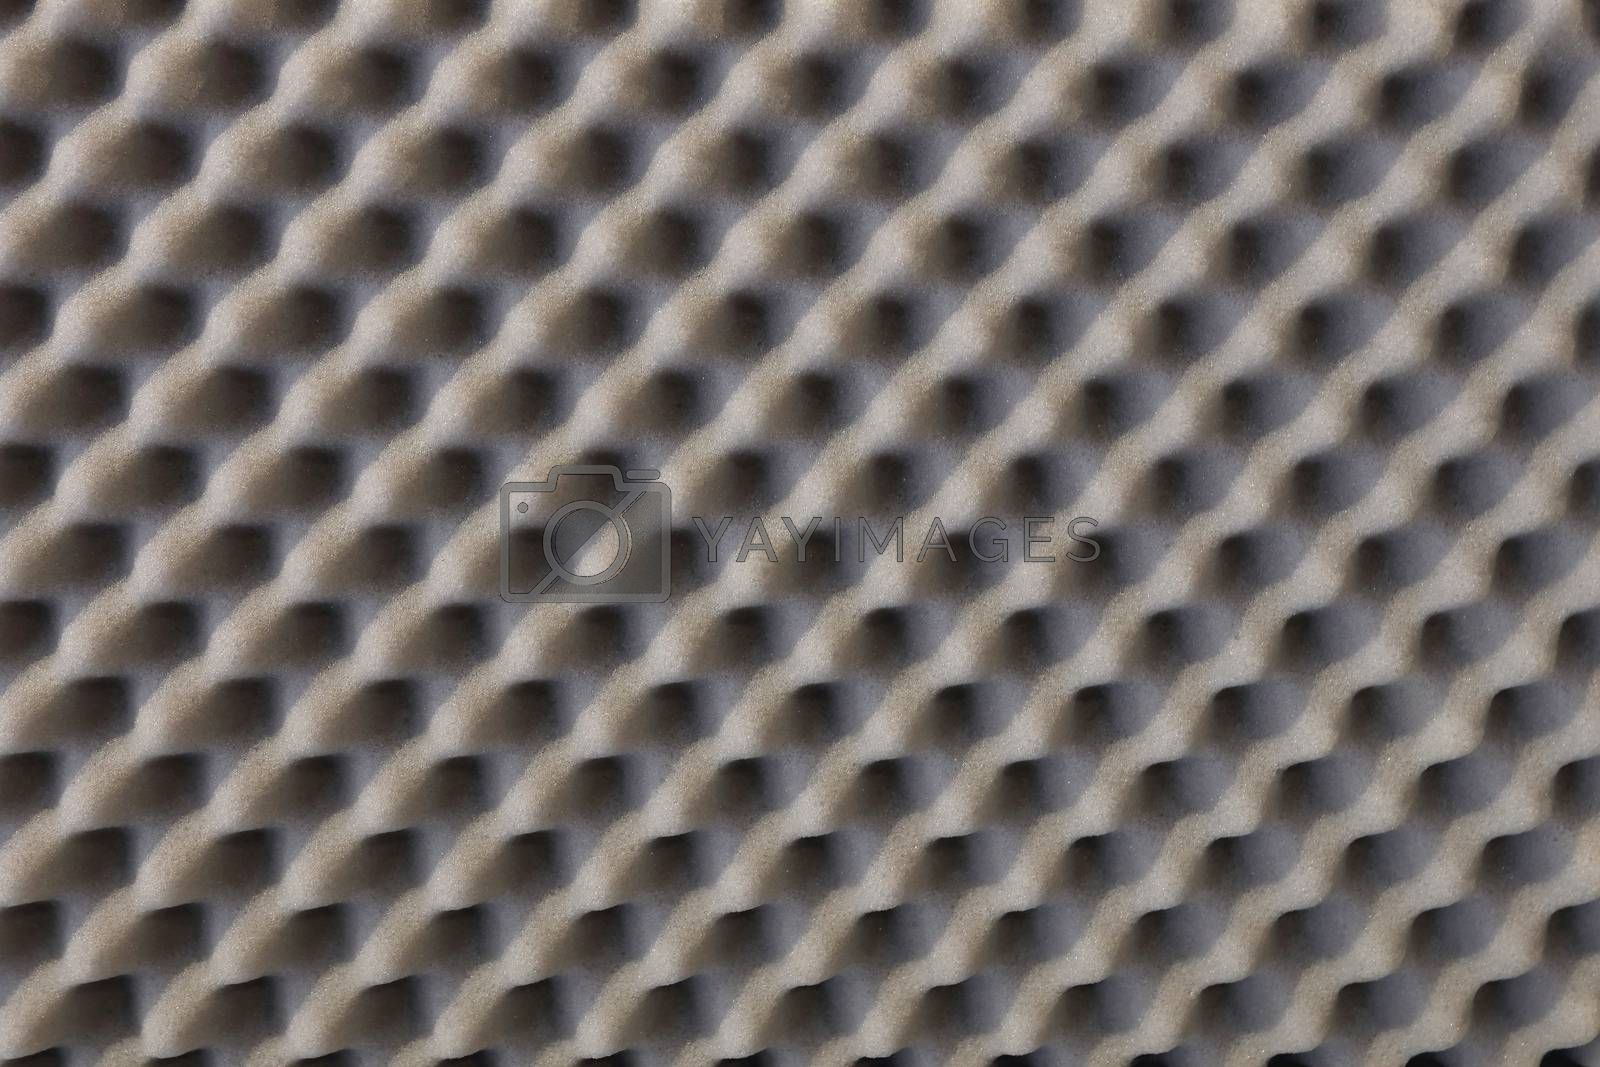 Sound absorbing sponge isolation for studio